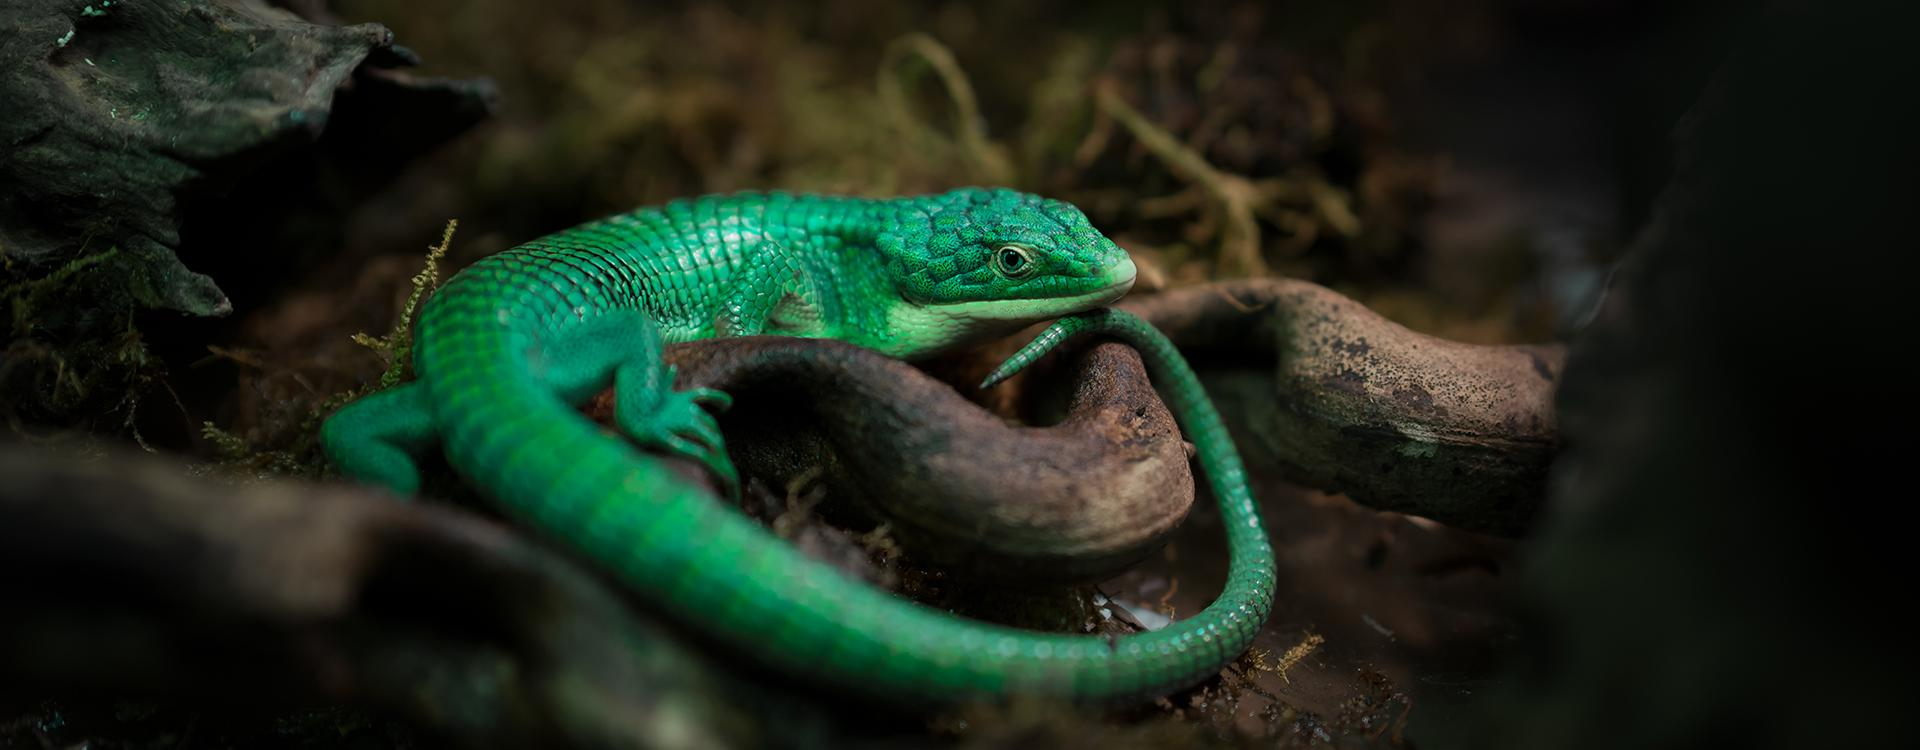 an alligator lizard on the ground